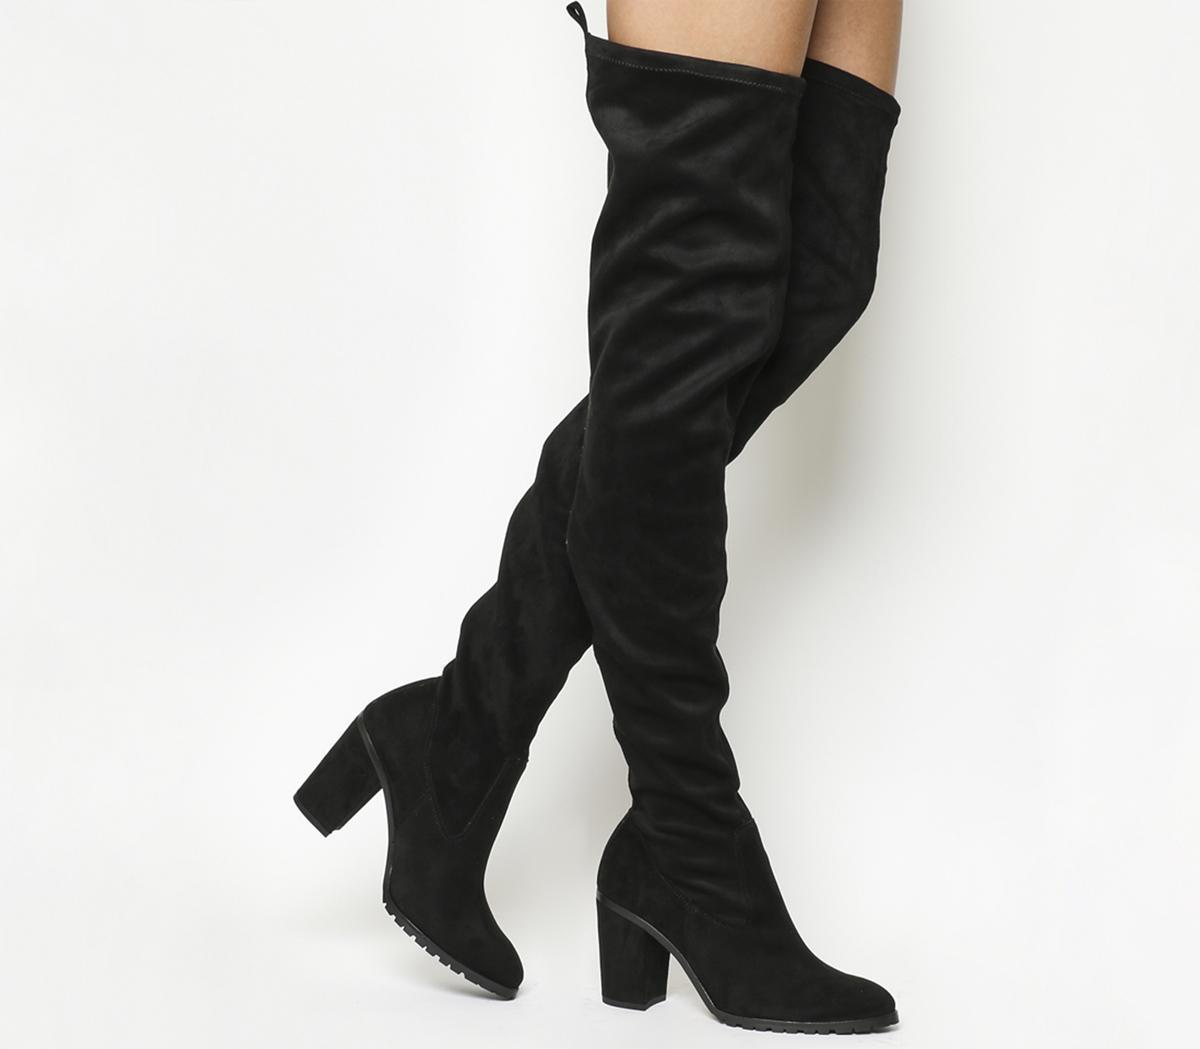 Ka Pow Over The Knee Boots